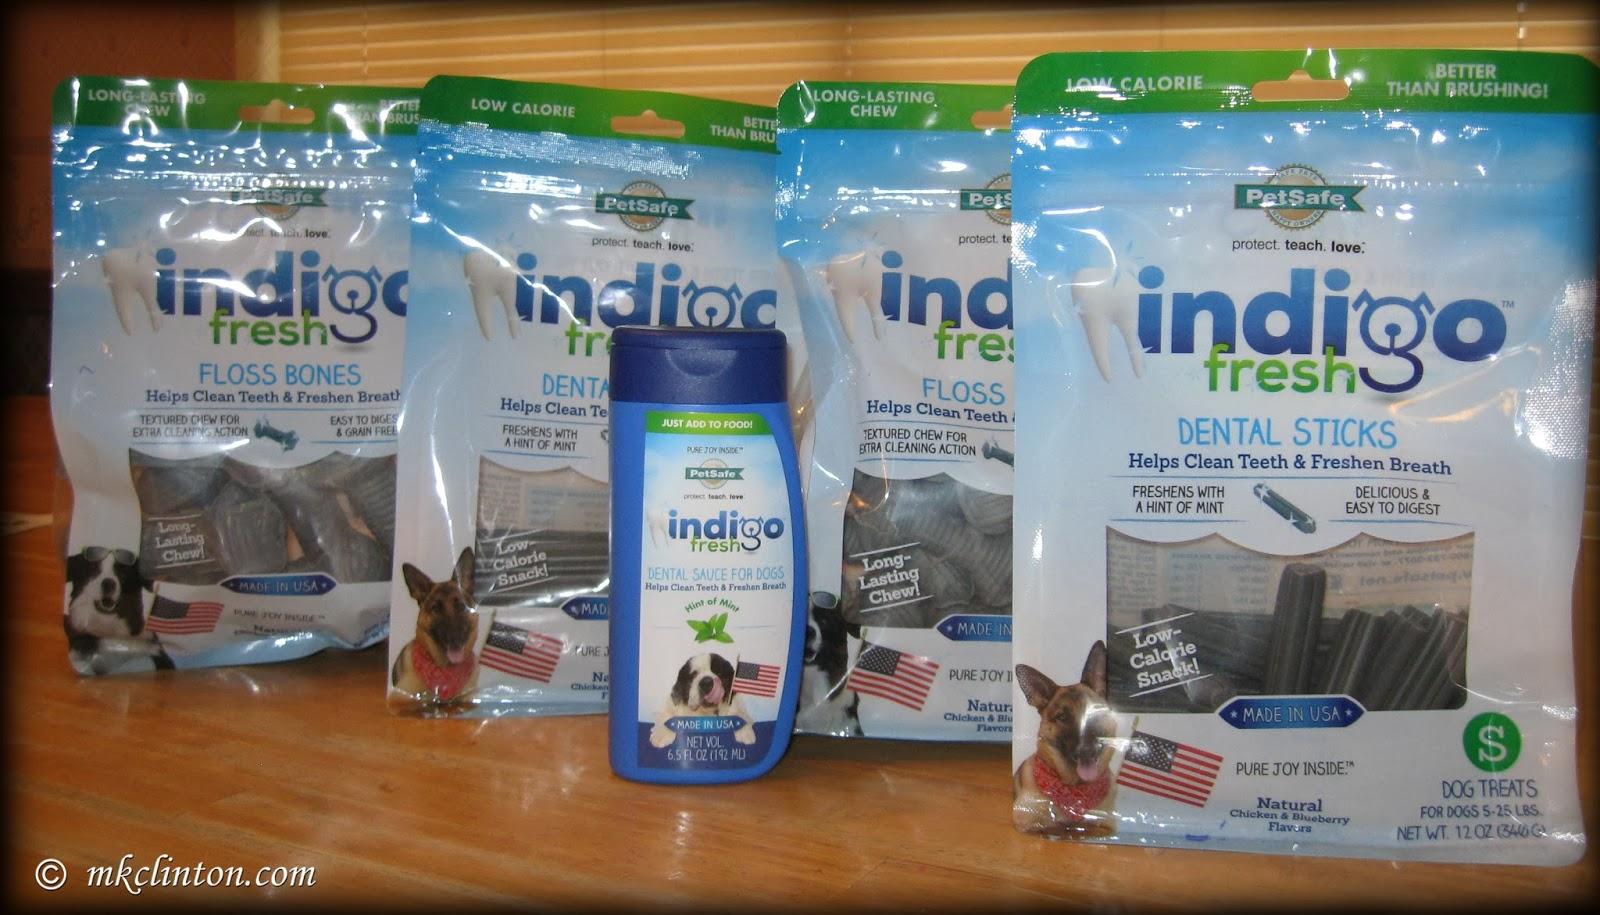 Indigo dog dental treats by PetSafe